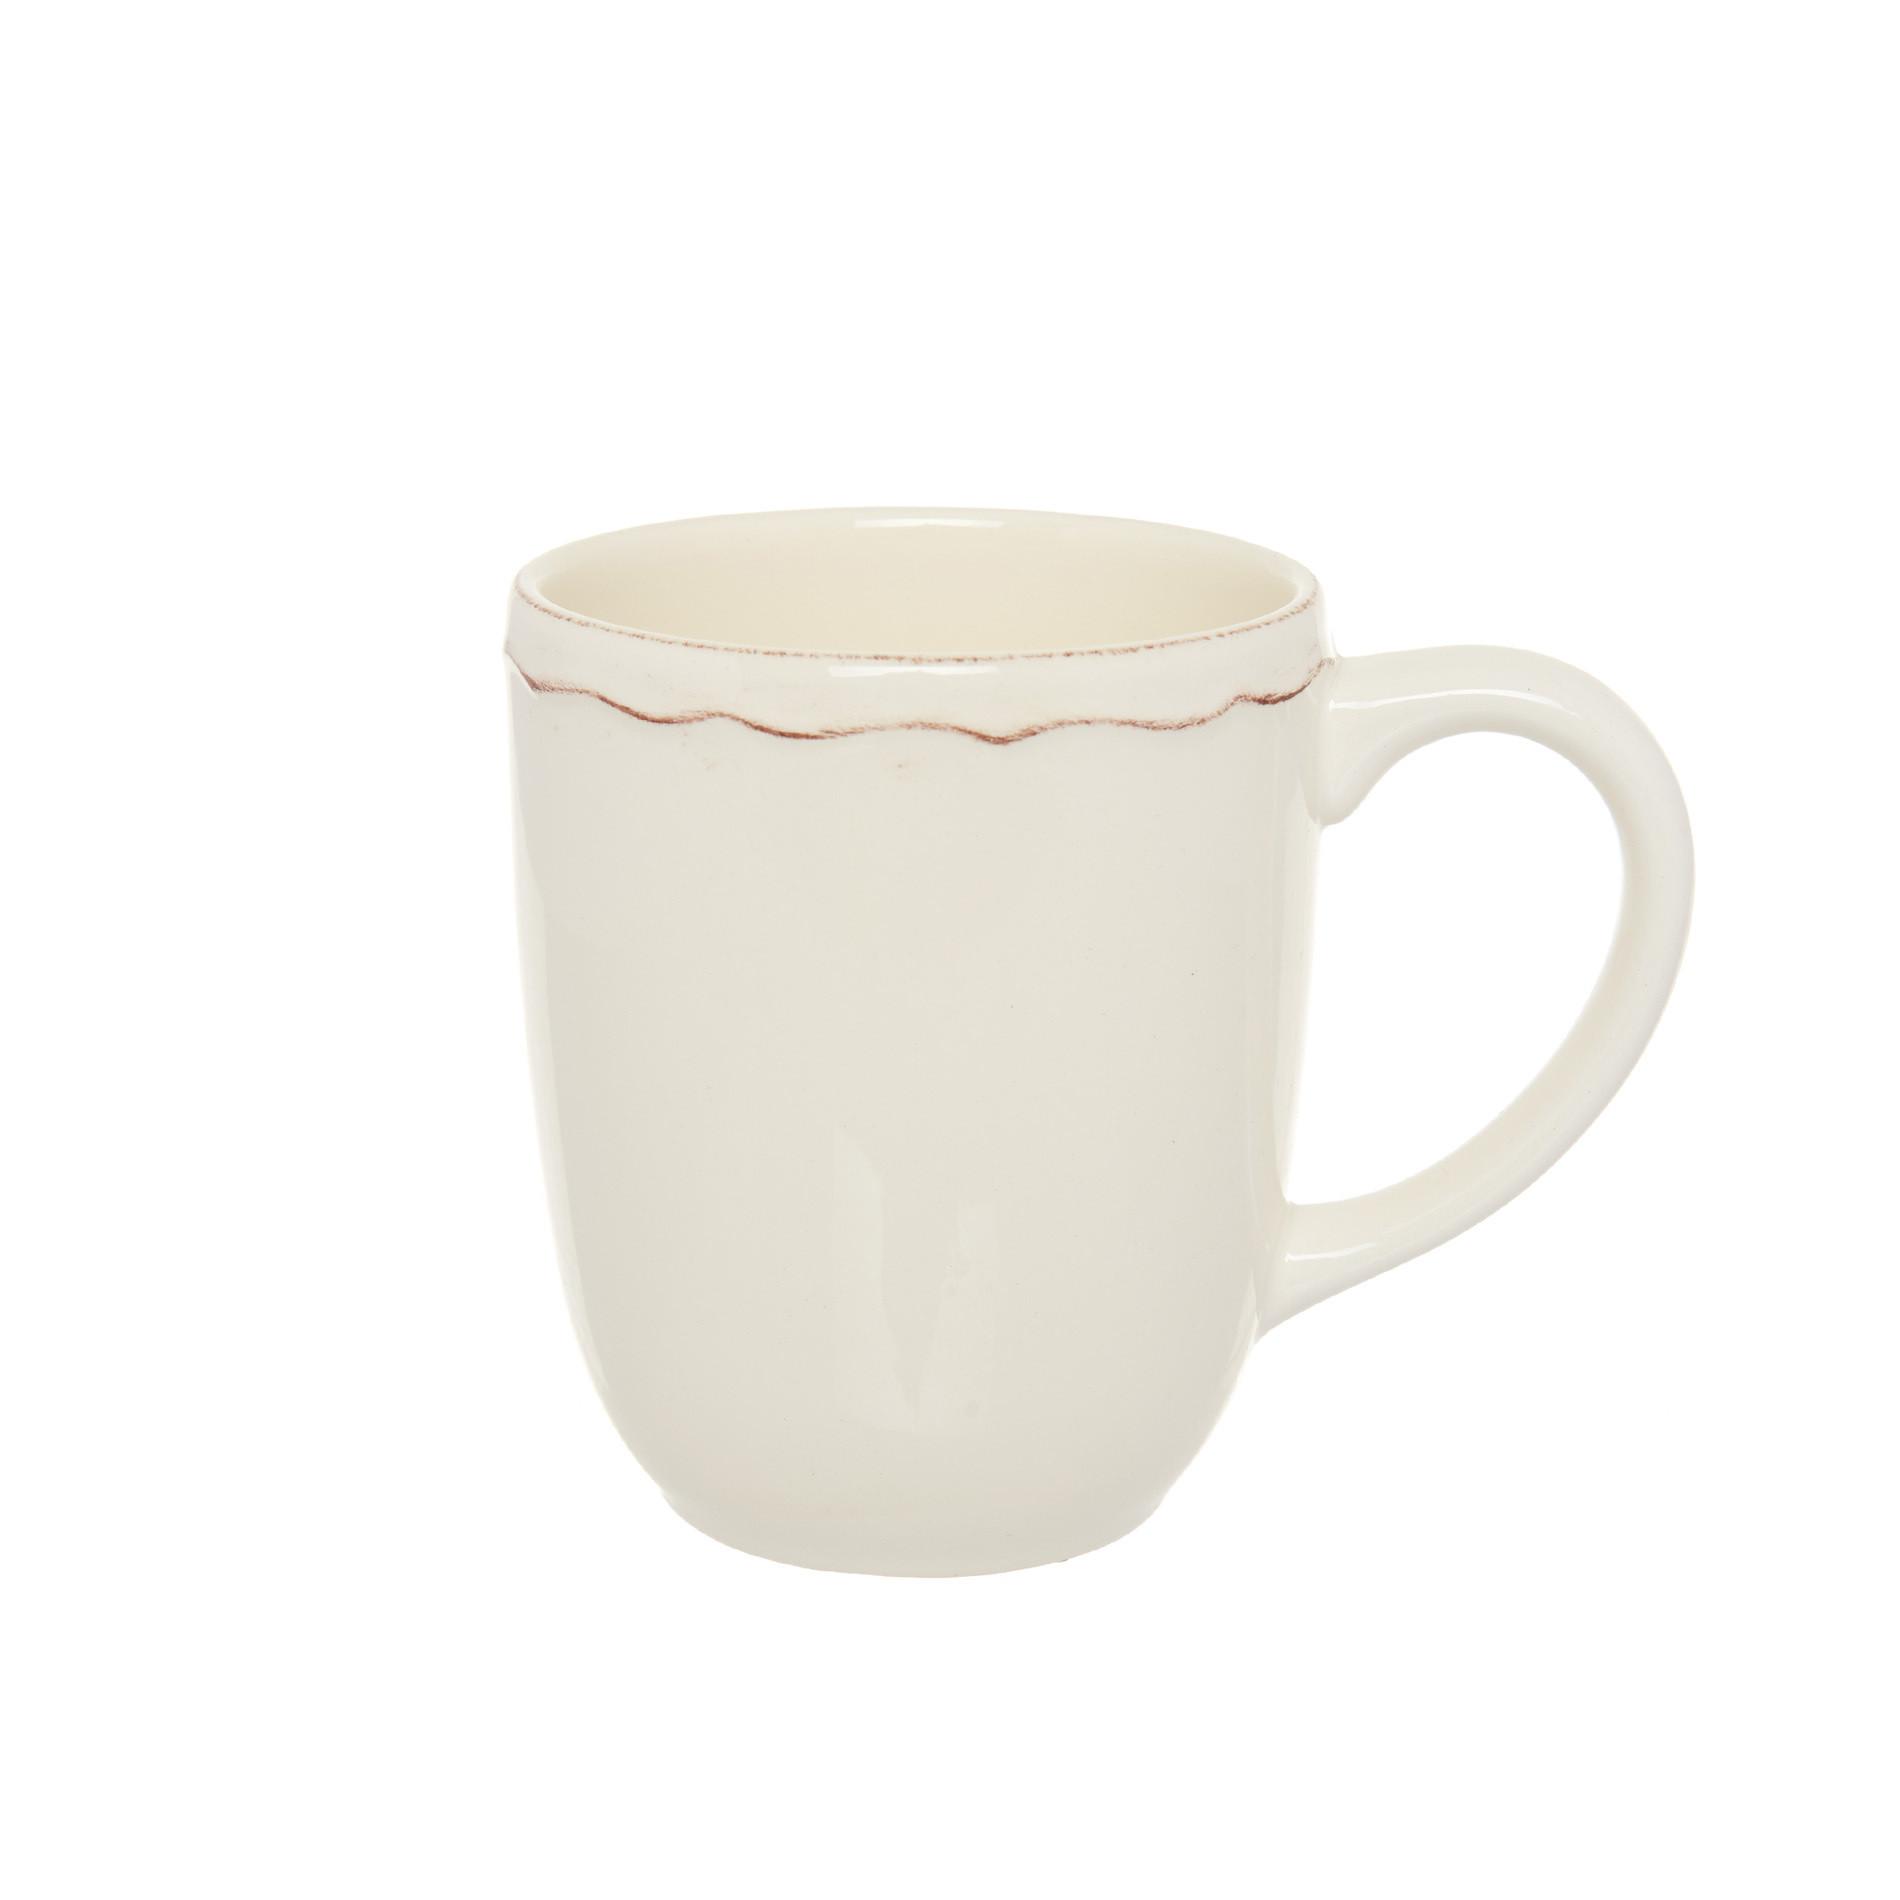 Mug ceramica Dona Maria, Bianco panna, large image number 0